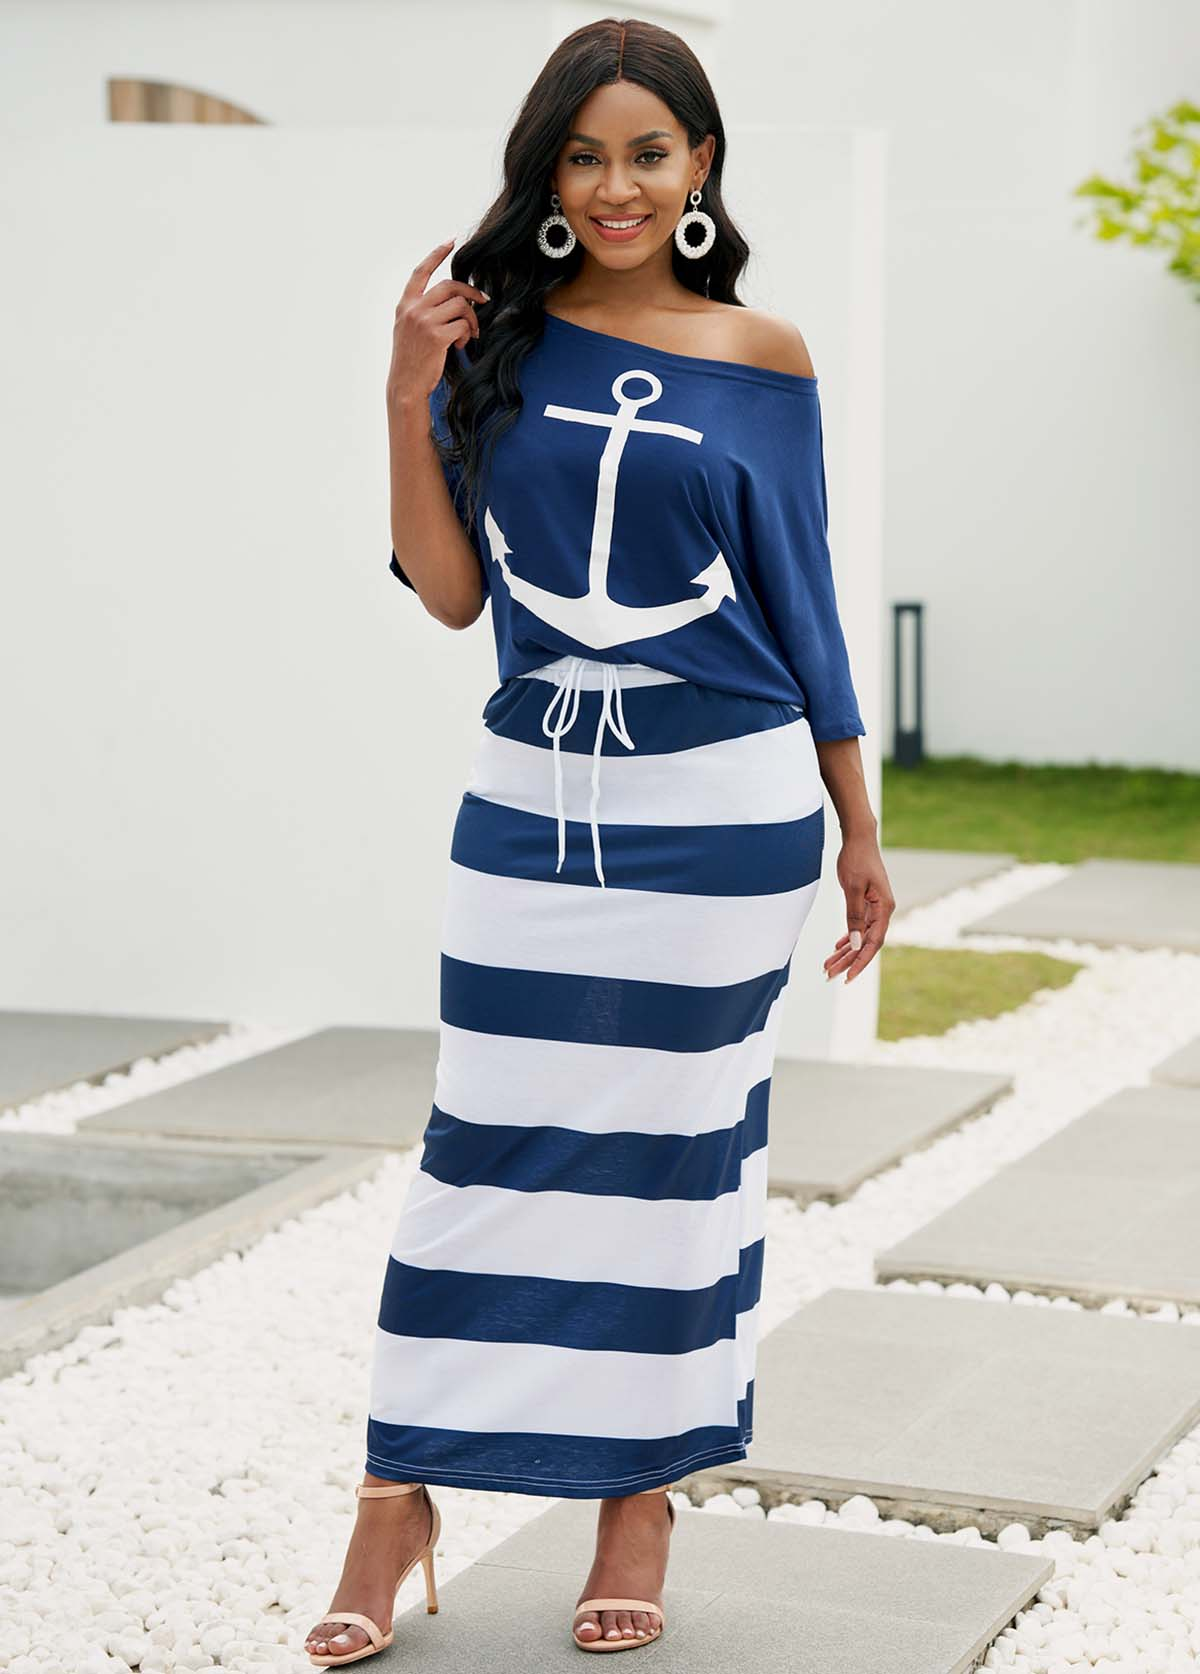 Skew Neck T Shirt and Striped Drawstring Waist Skirt